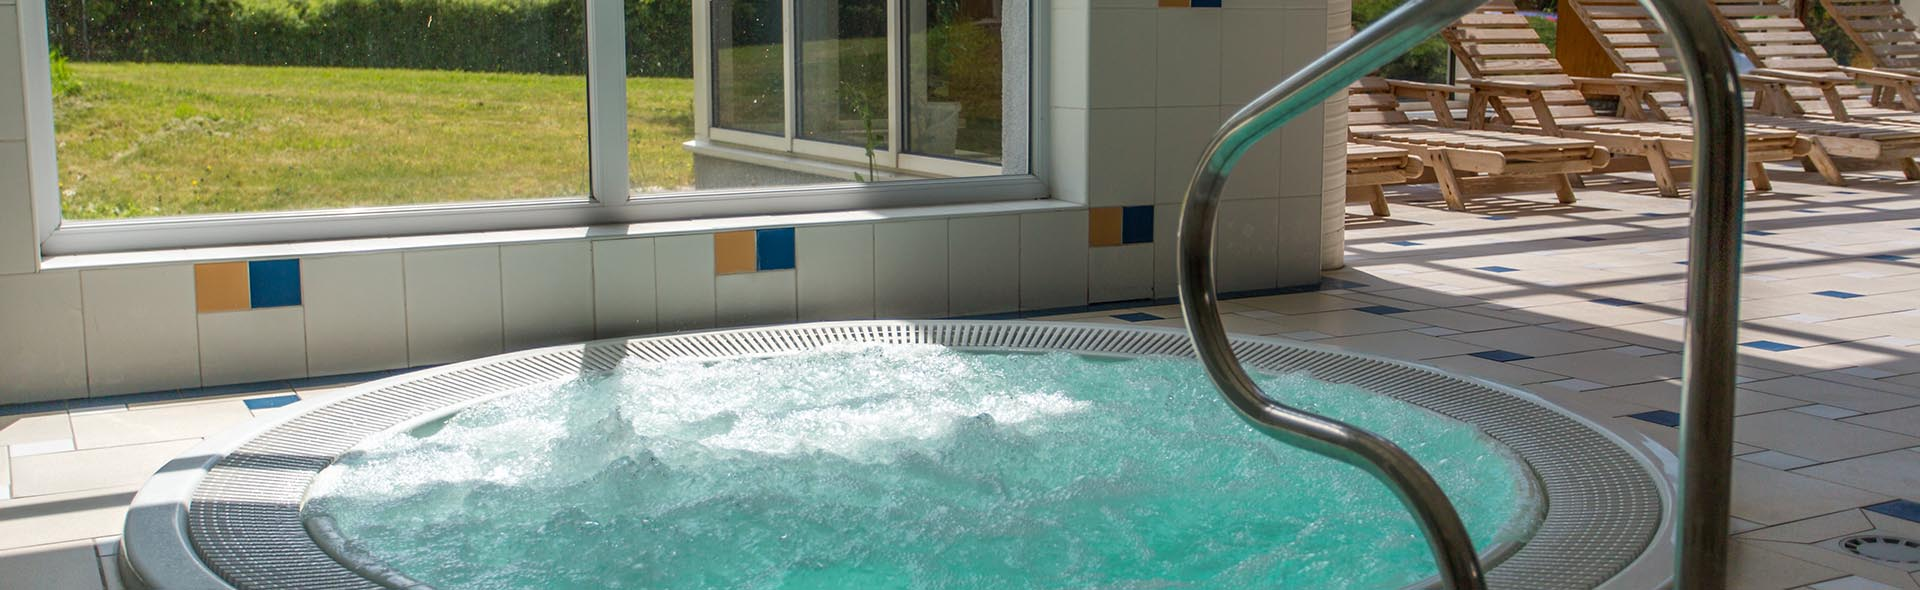 Bazény a vířivky